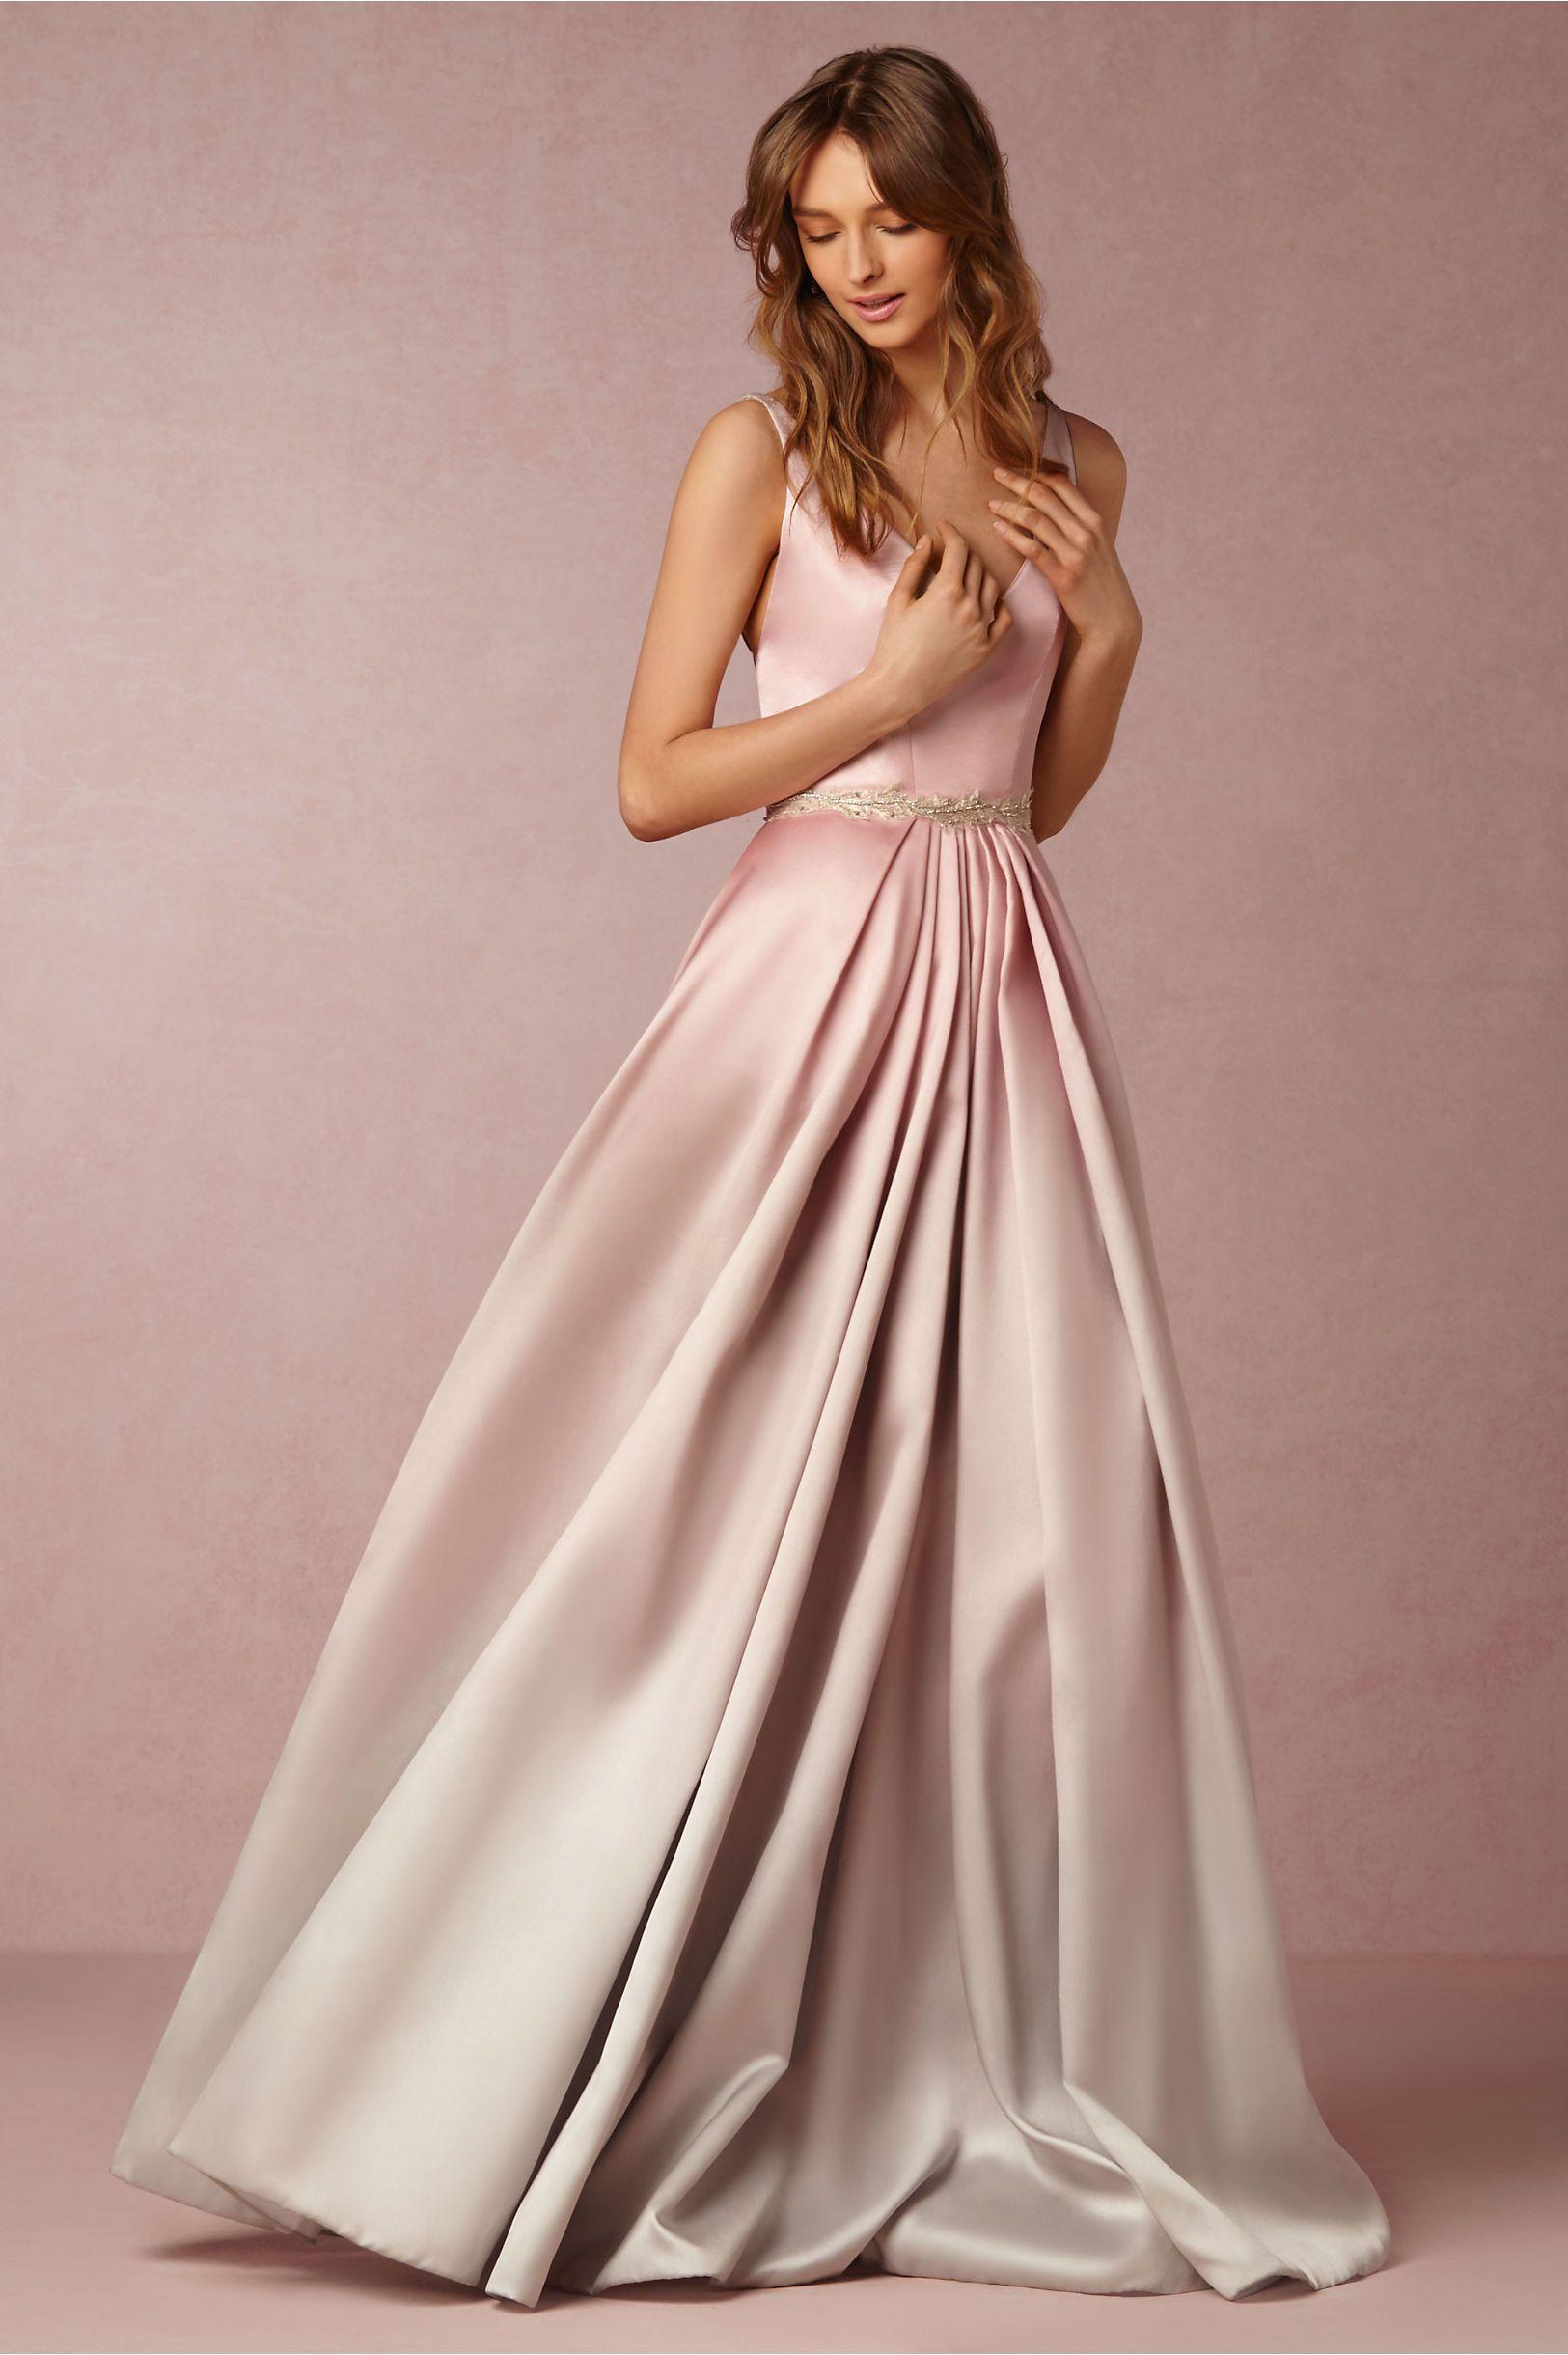 3ce43aaa8ea20 BHLDN Lorraine Dress / Wedding gown / Engagement Party / Rehearsal Dinner /  Formal / Avant Garde / Ombre Silk